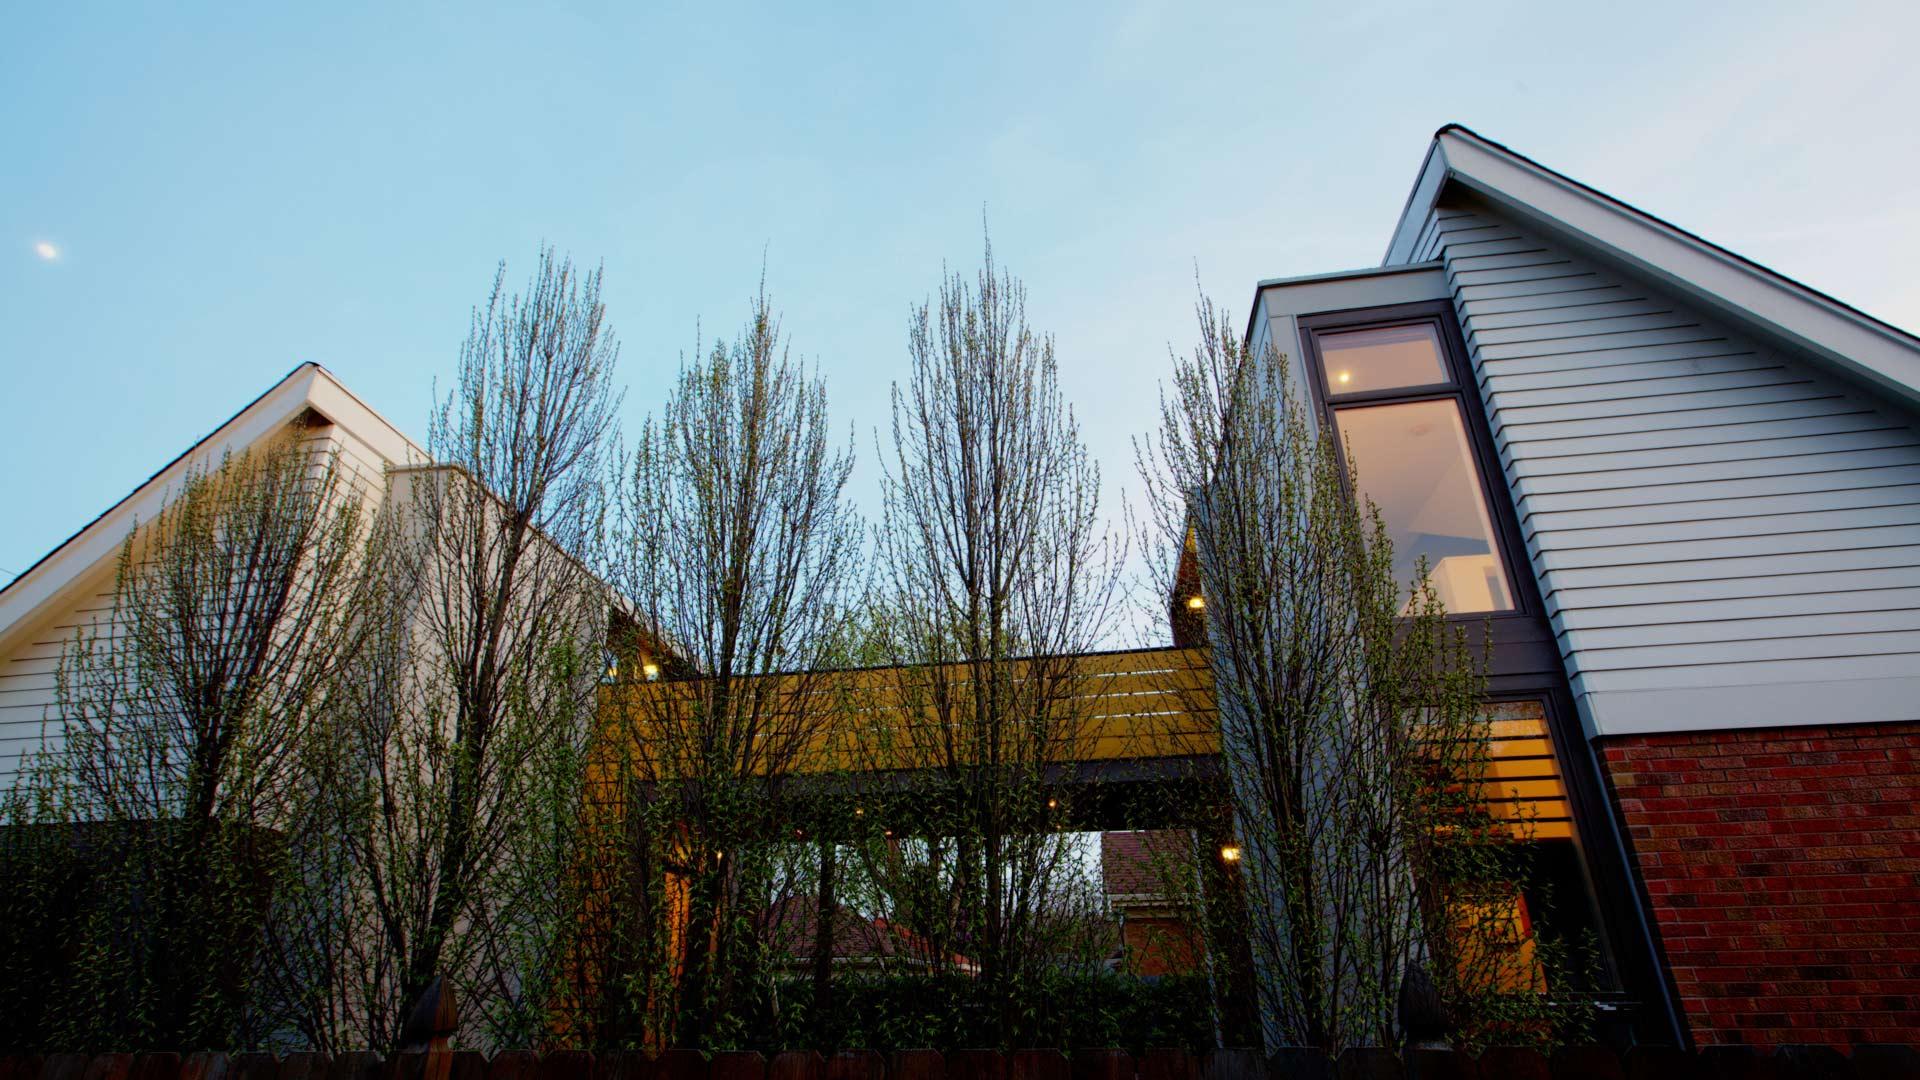 Classic Irvington Tudor Remodel - Bridge Spans House and Studio - HAUS Architecture, Christopher Short, Indianapolis Architect